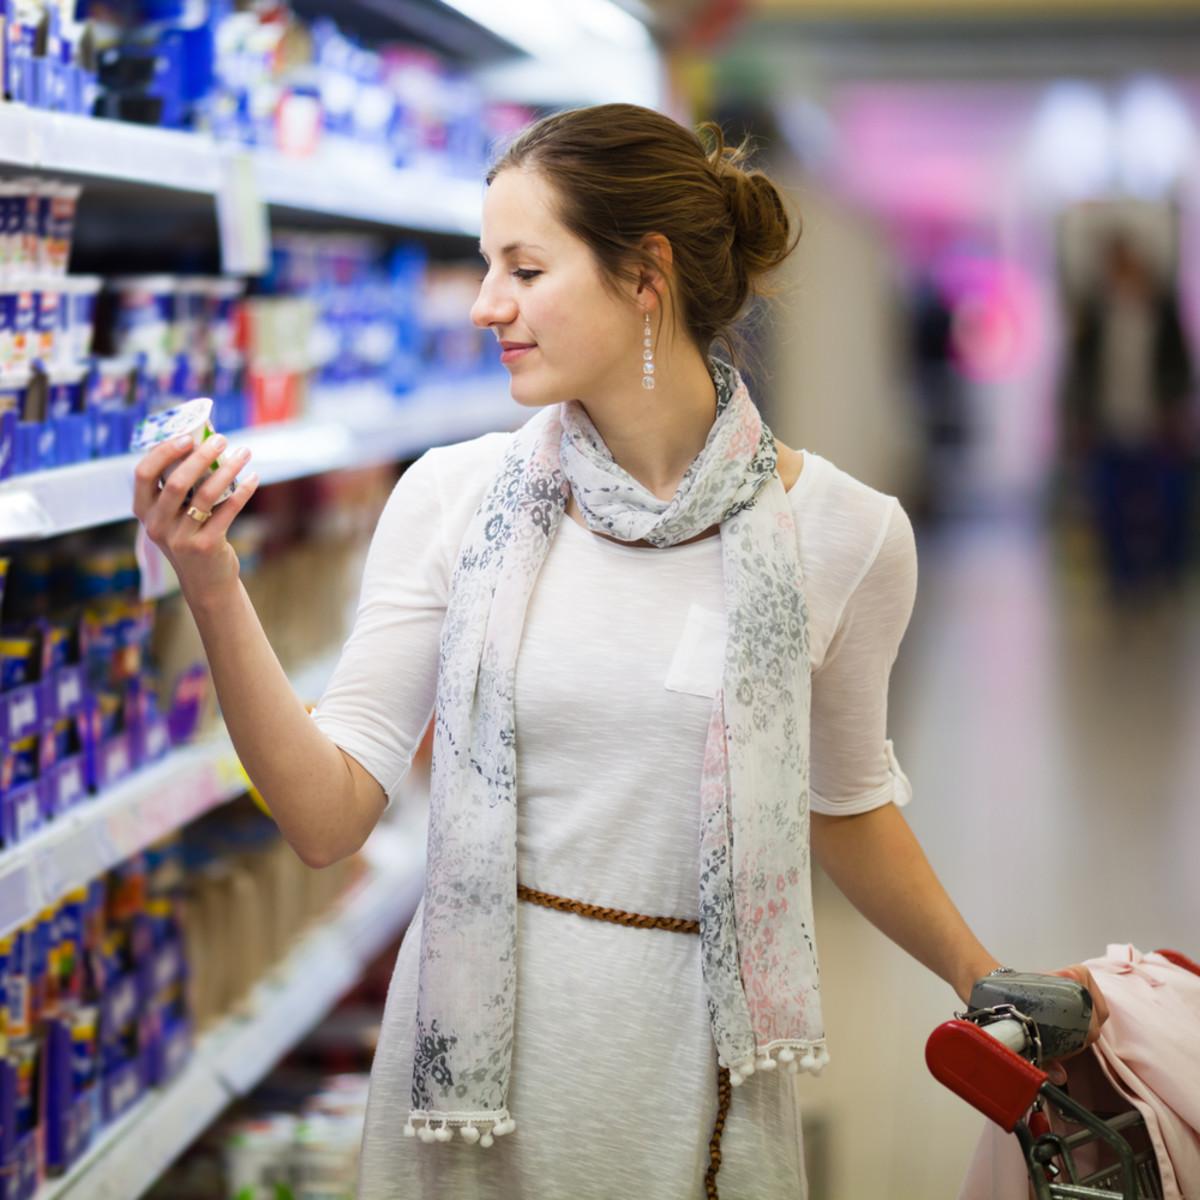 USDA Secretary Vilsack Demands Mandatory, Nationwide GMO Labeling Policy